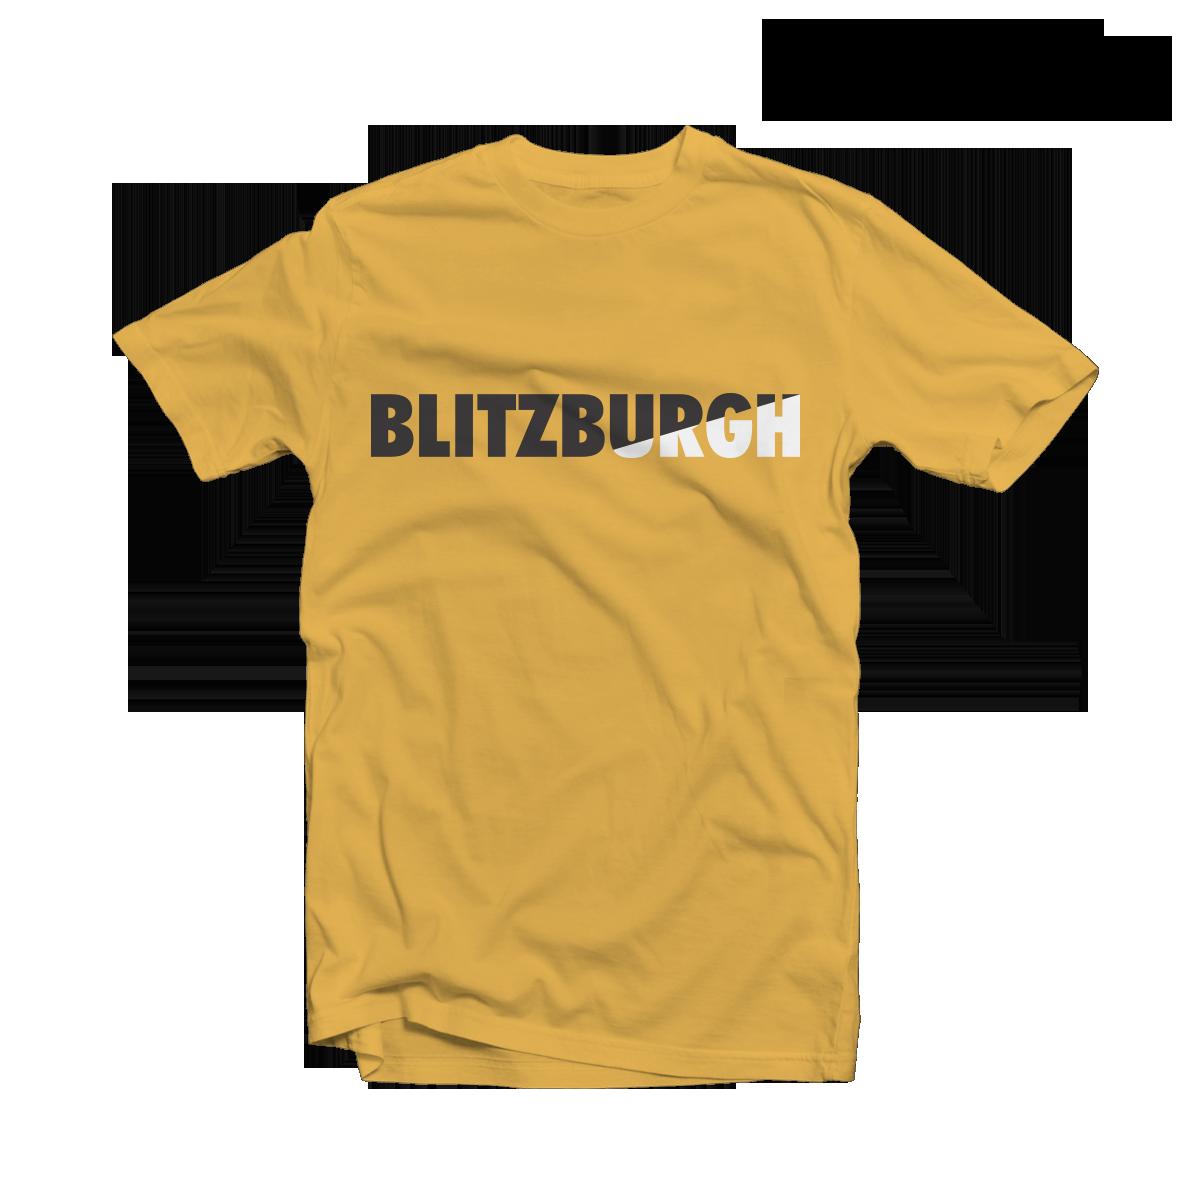 1d138e556 ... Steelers Shirts Cheap – Blitzburgh Yellow Tee. BACK ...